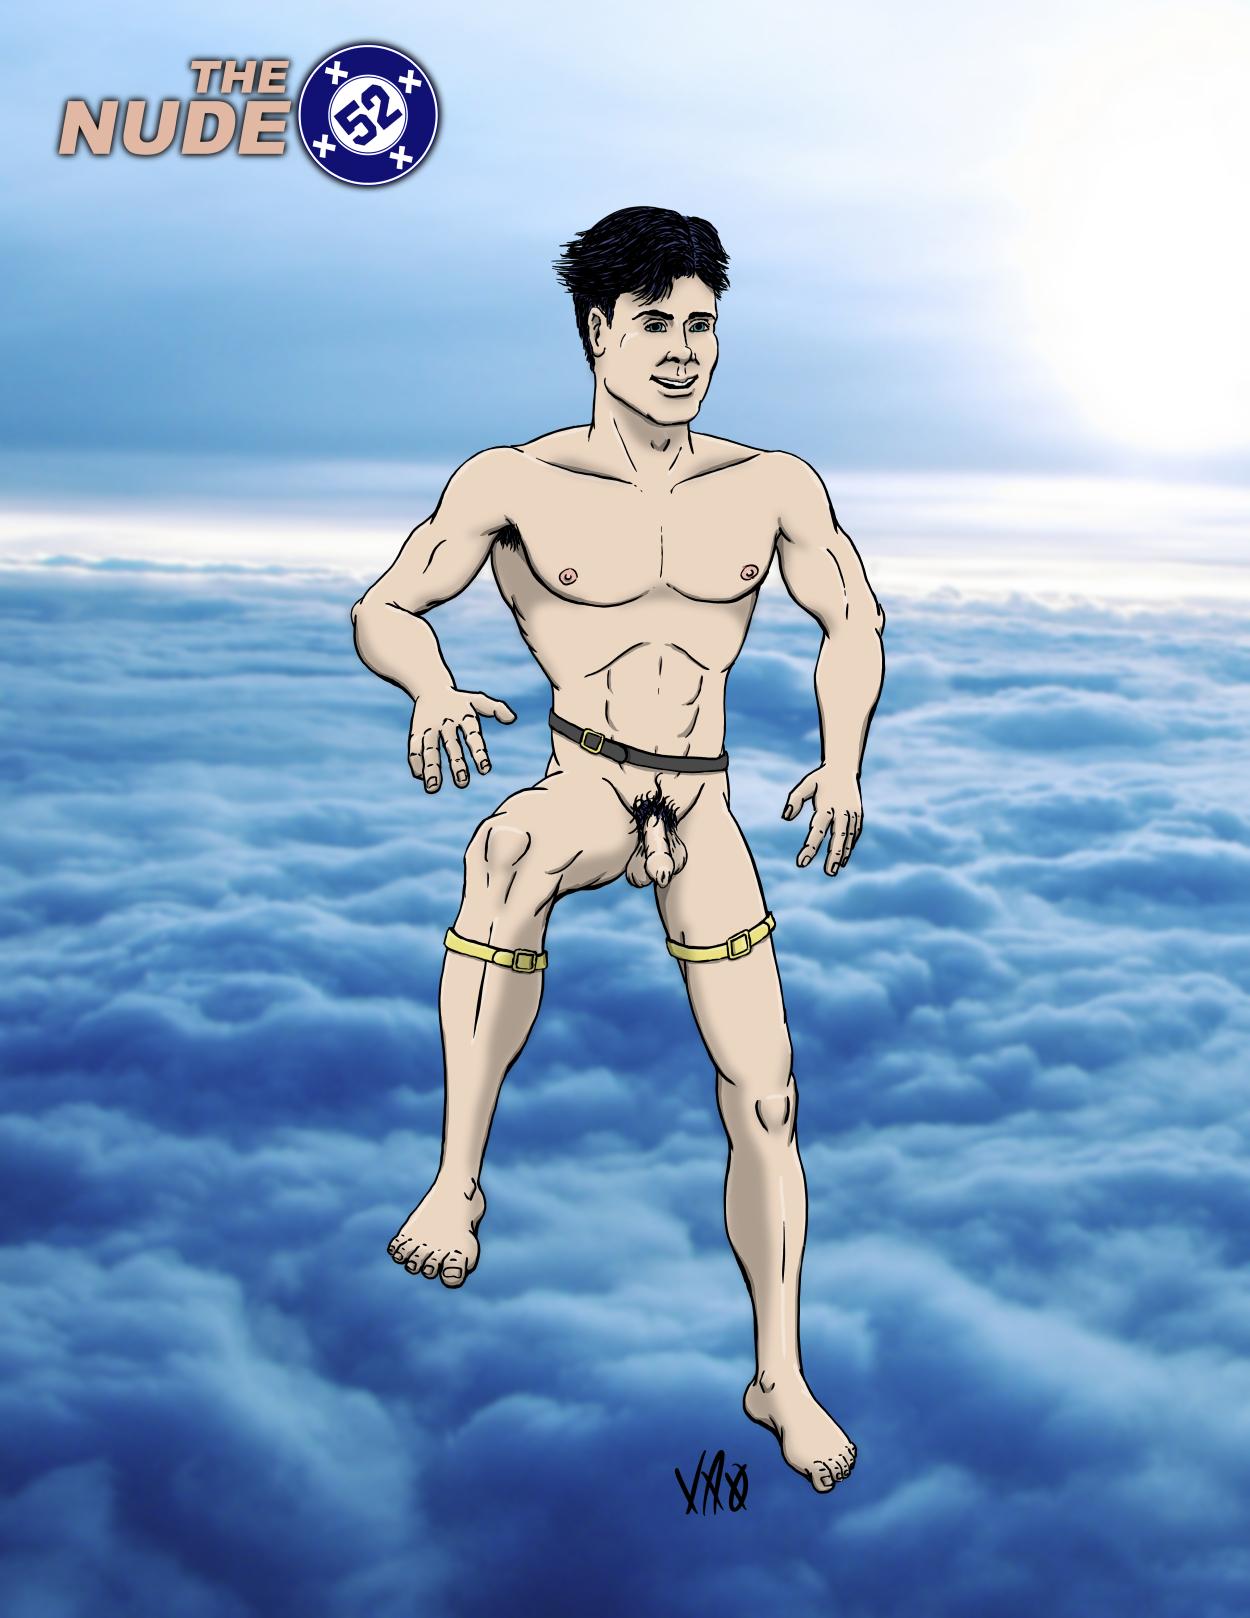 Nude 52 Superboy